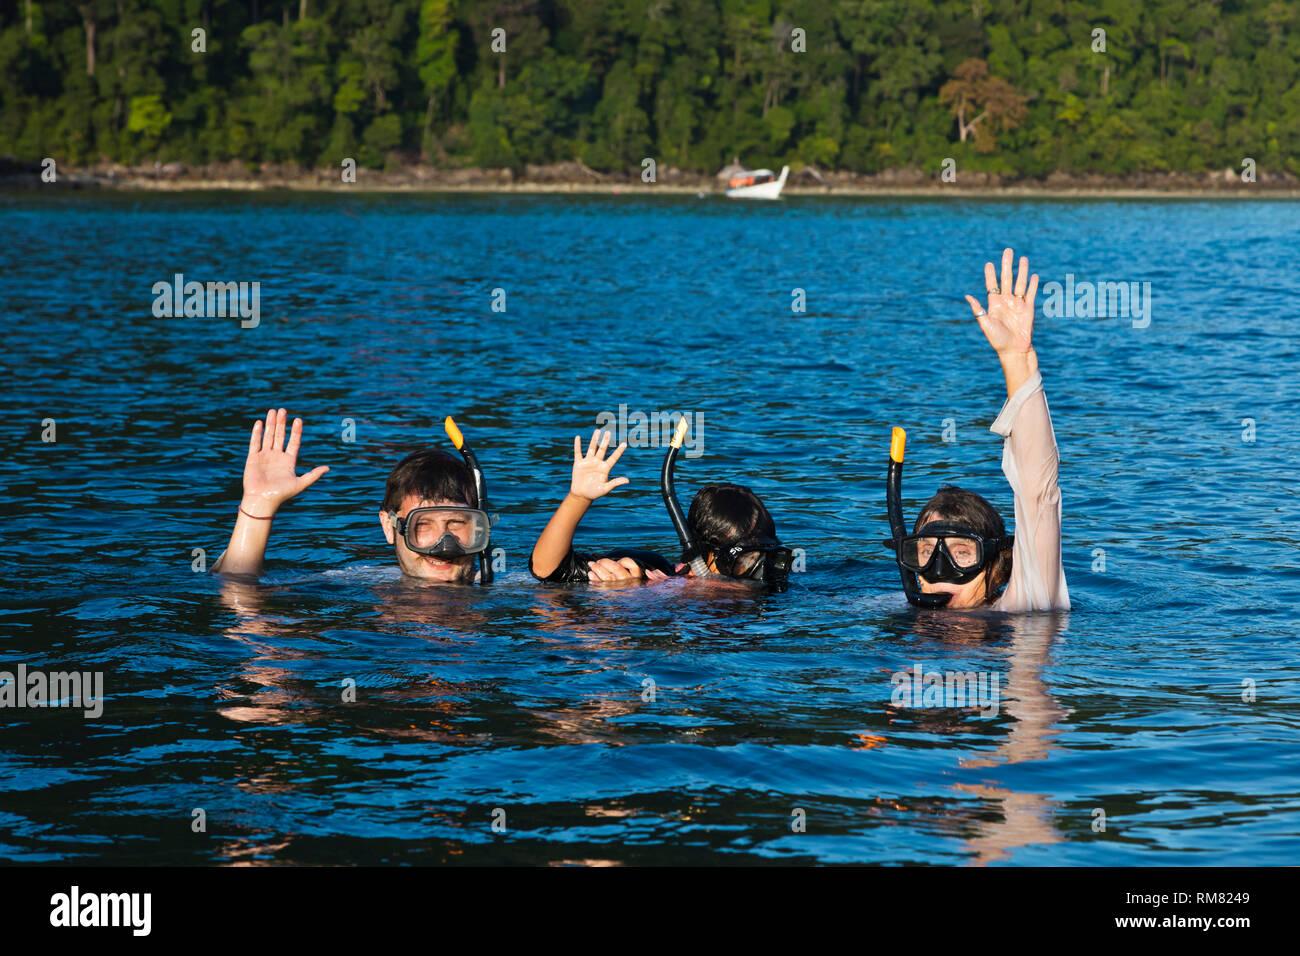 Snorkeling along the coast of KO SURIN THAI ISLAND in MU KO SURIN NATIONAL PARK - THAILAND - Stock Image